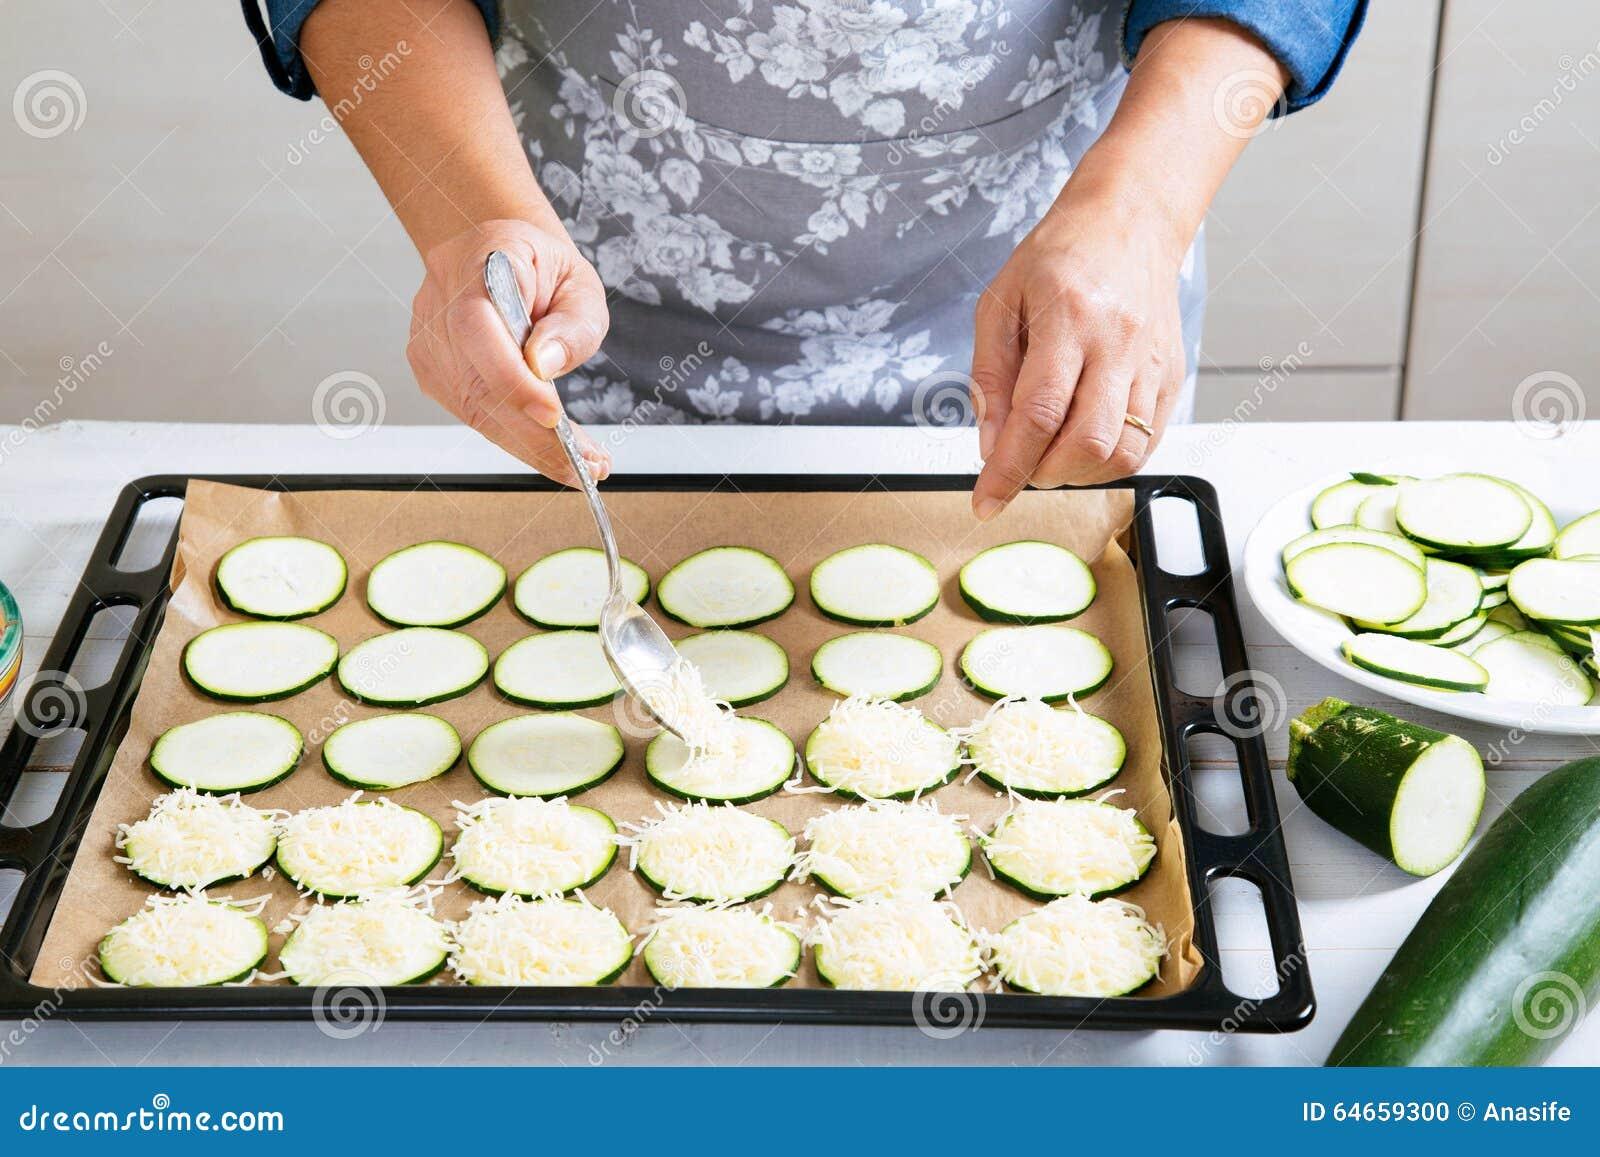 courgette bakken met kaas